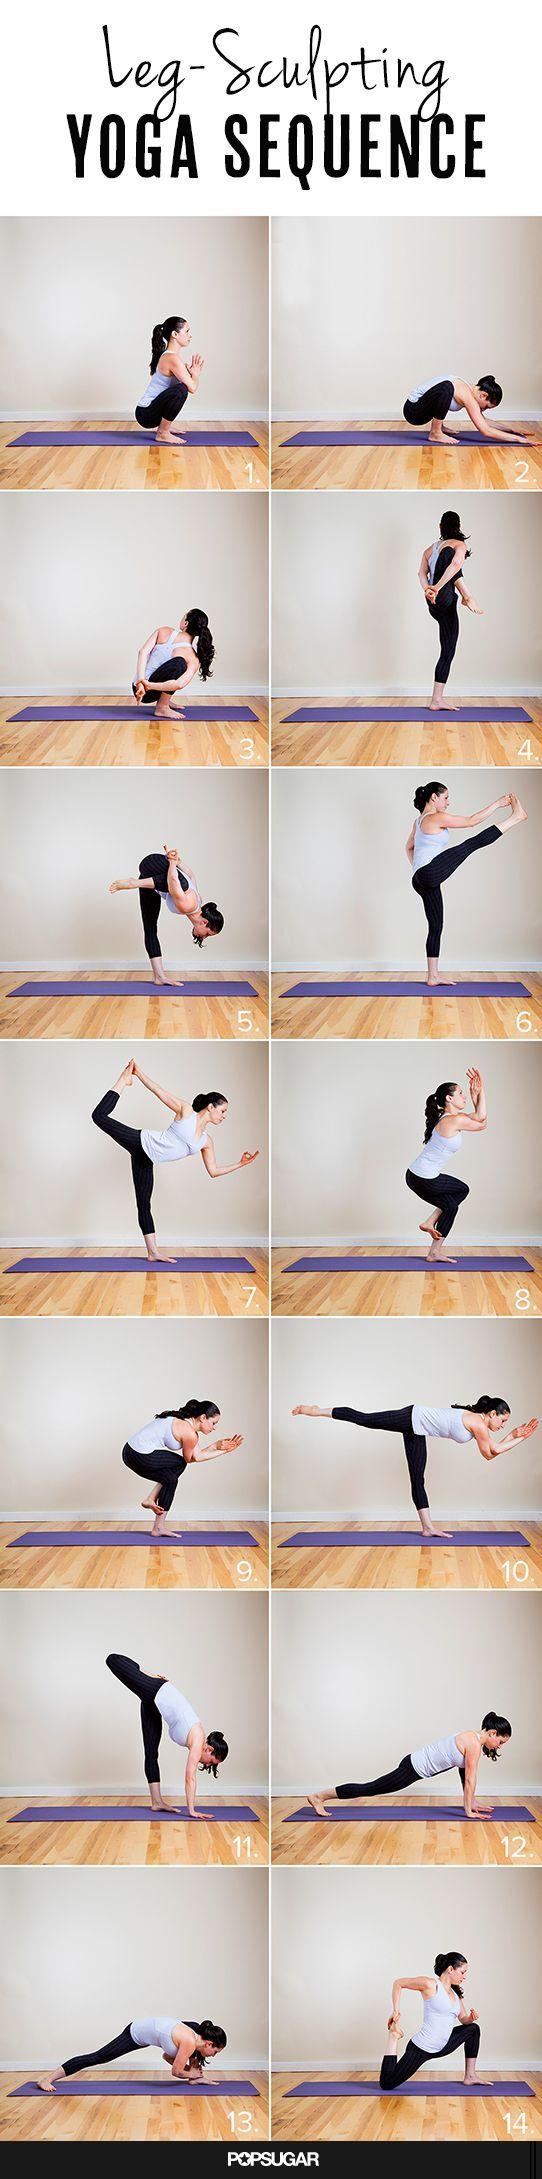 Leg Sculpting Yoga Sequence, hold God 5 breaths